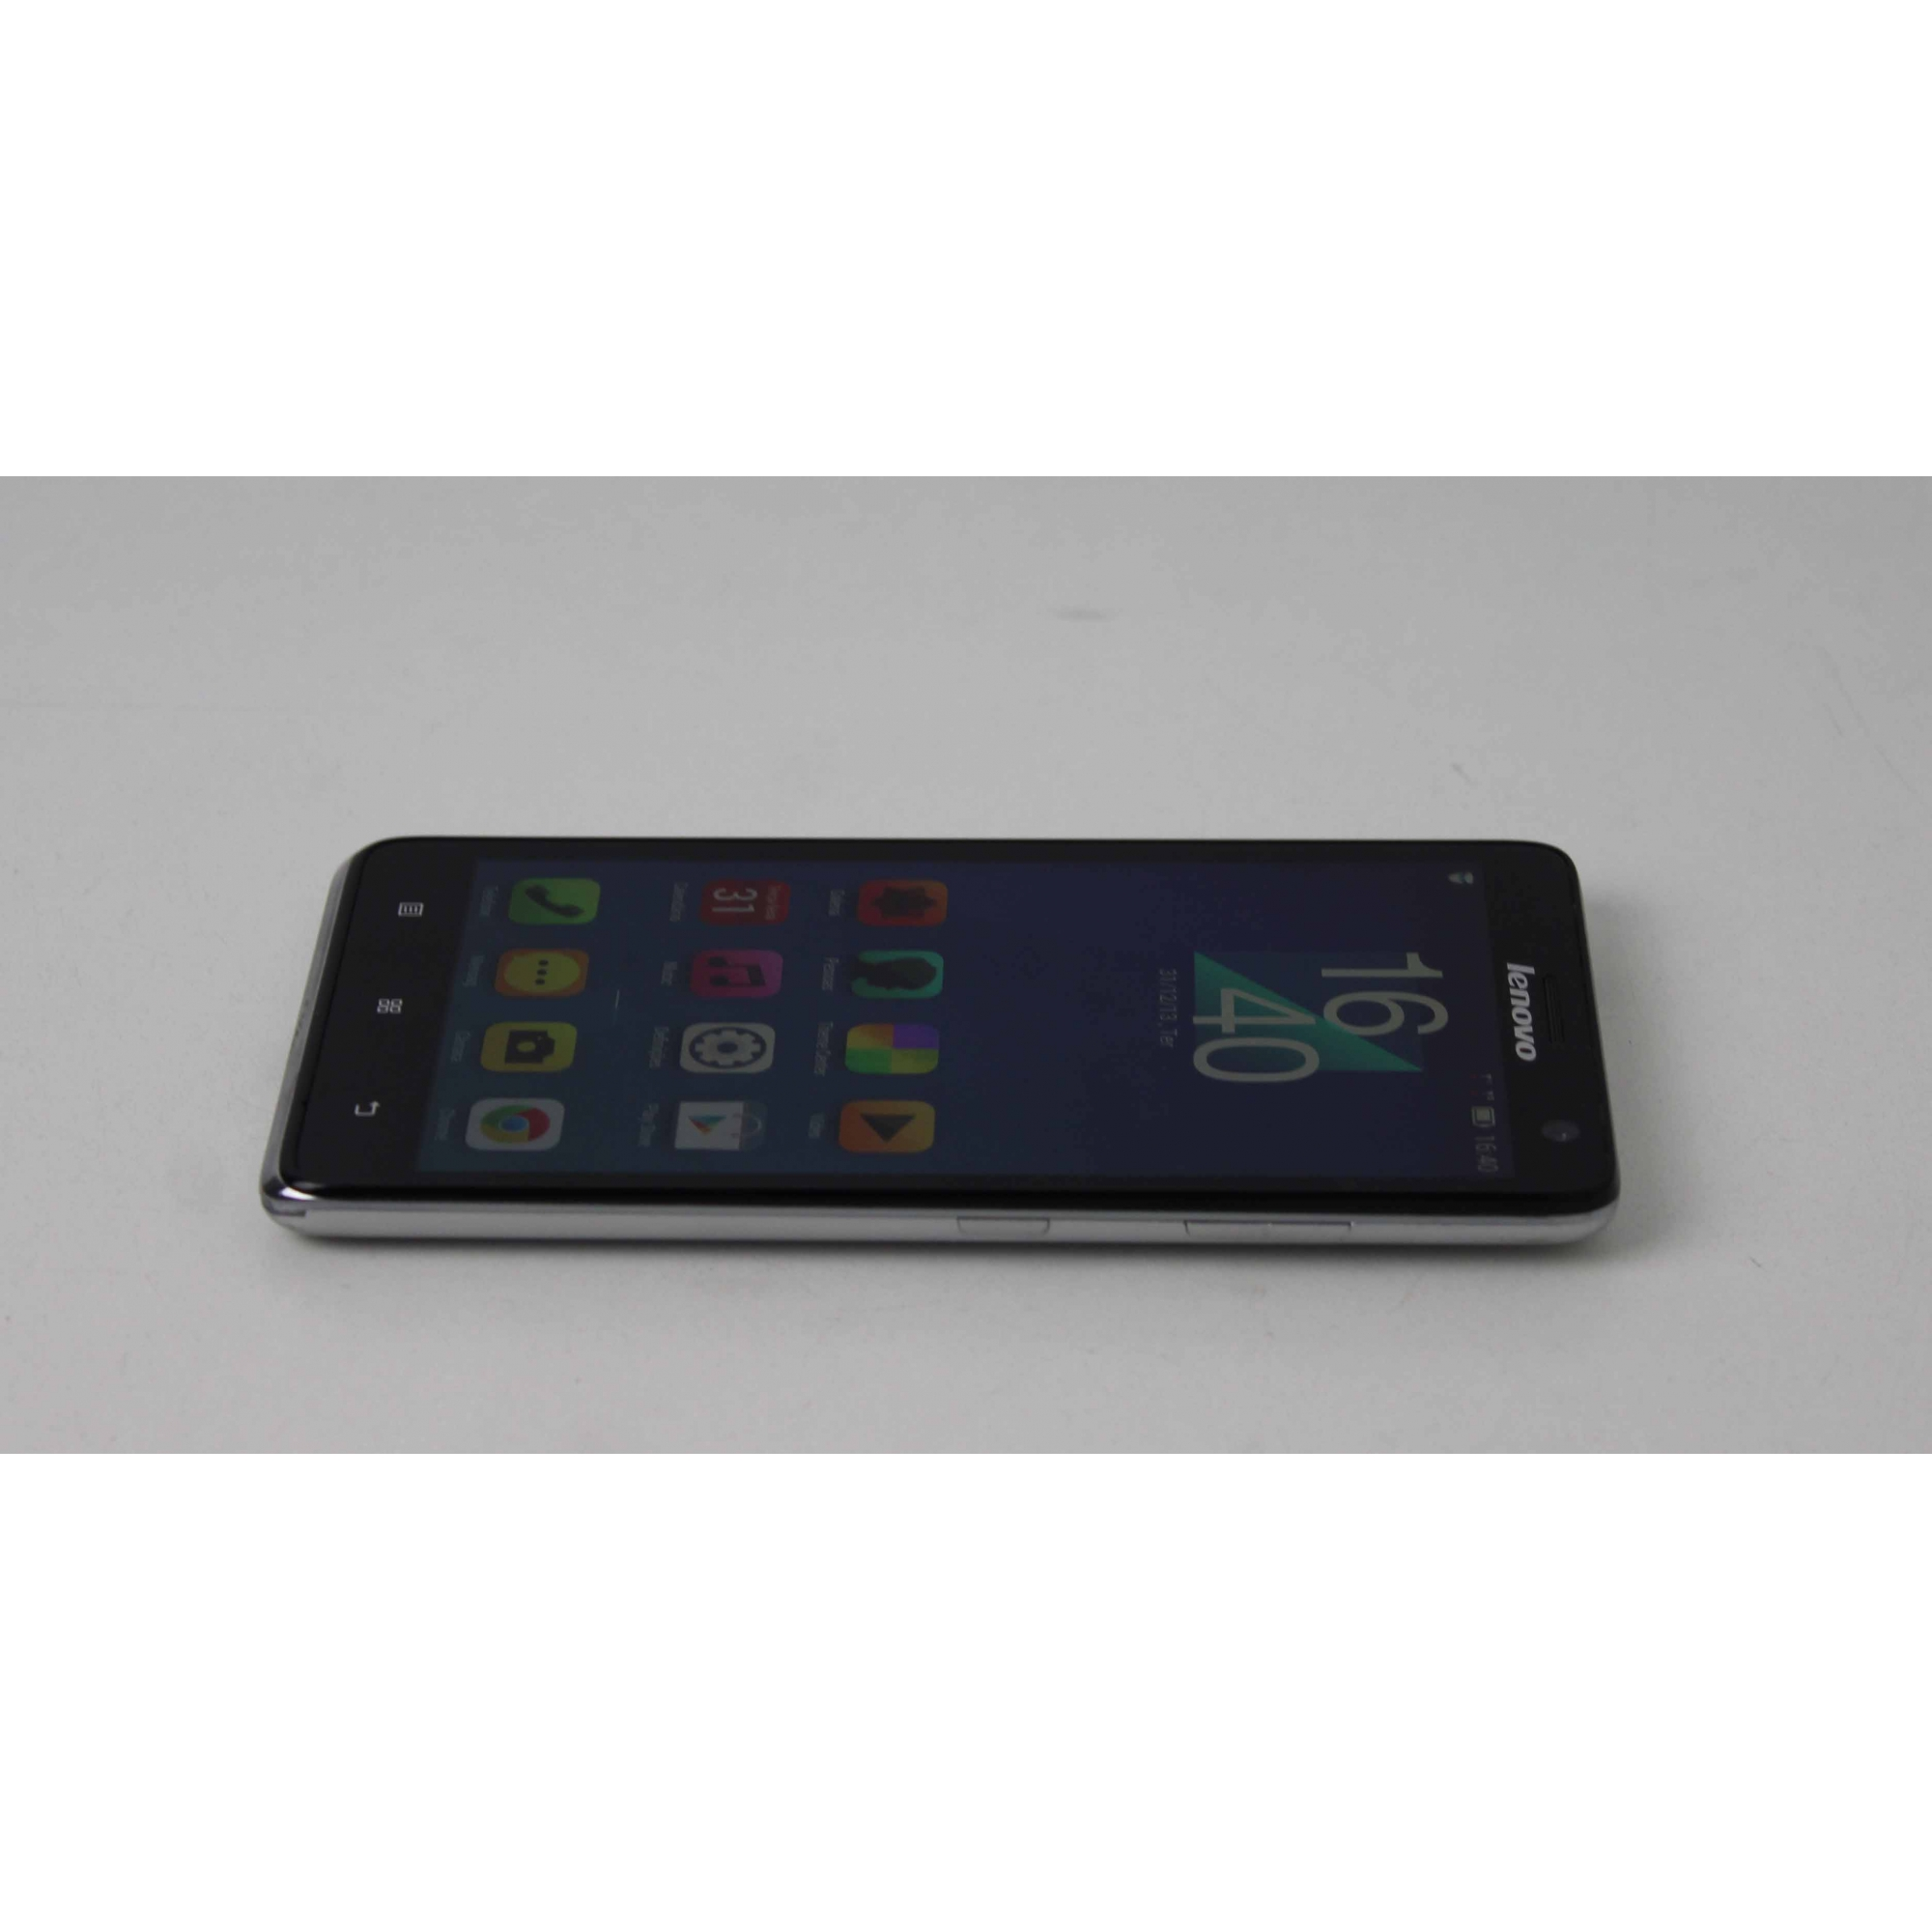 "Smartphone Lenovo S856 5.5"" 8GB - Prateado"